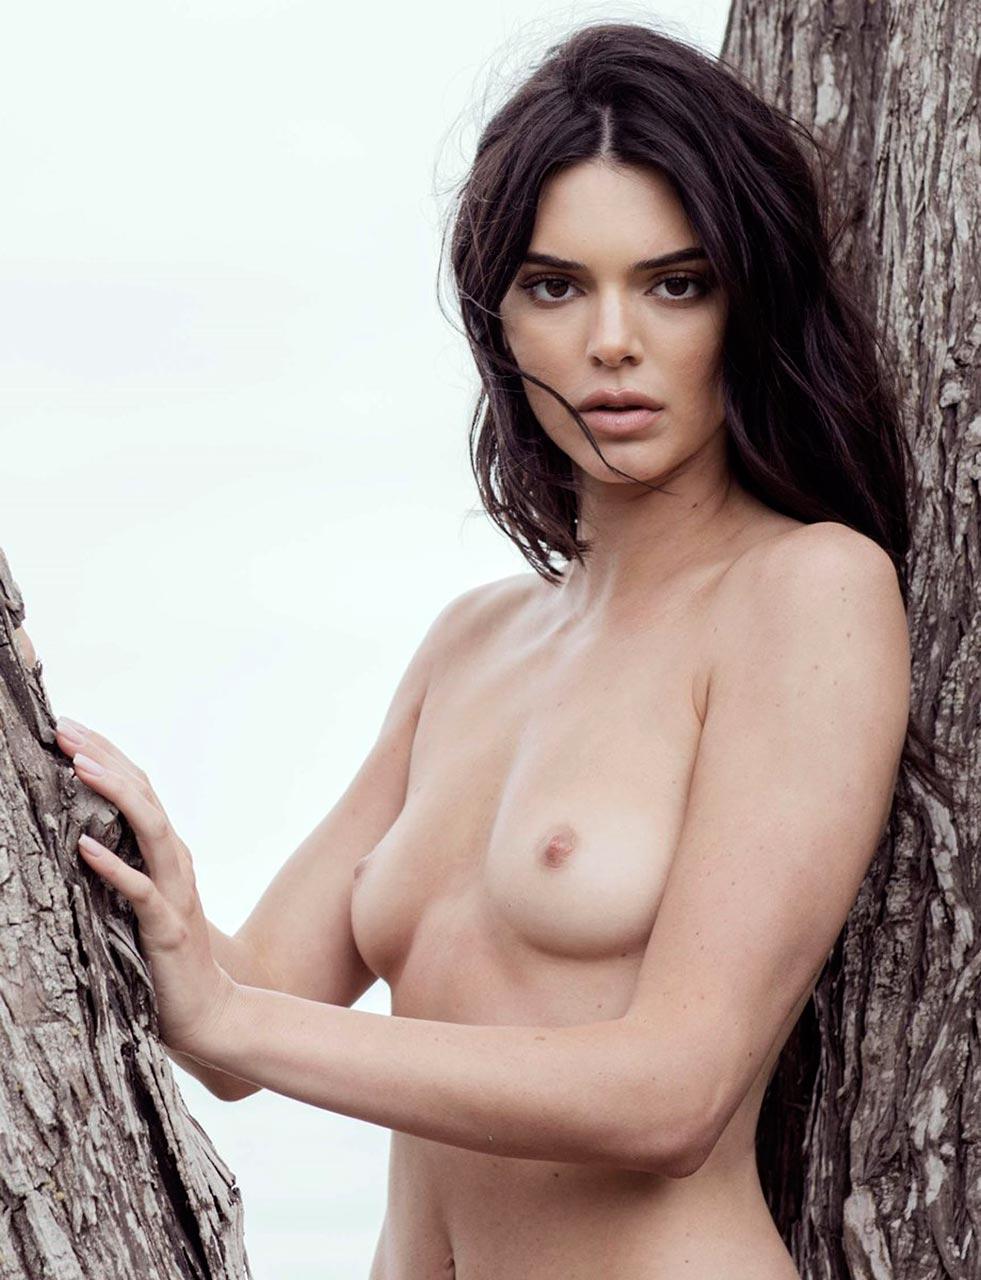 kendall jenner nude pics leaked